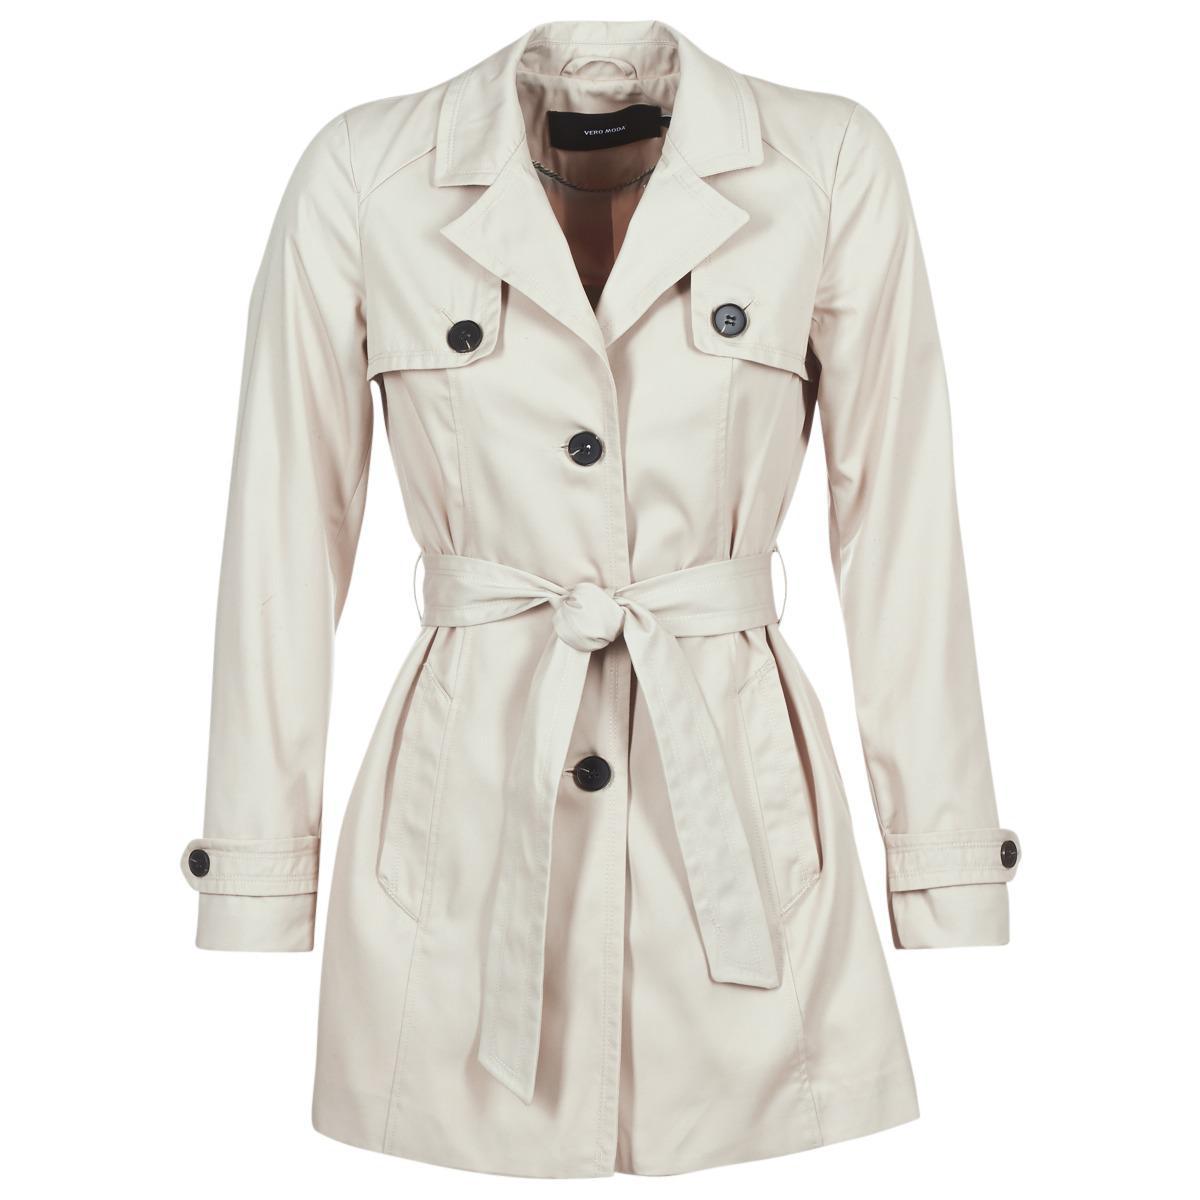 Vero Moda - Natural Vmgo Abby Women s Trench Coat In Beige - Lyst. View  fullscreen e839ecea5d